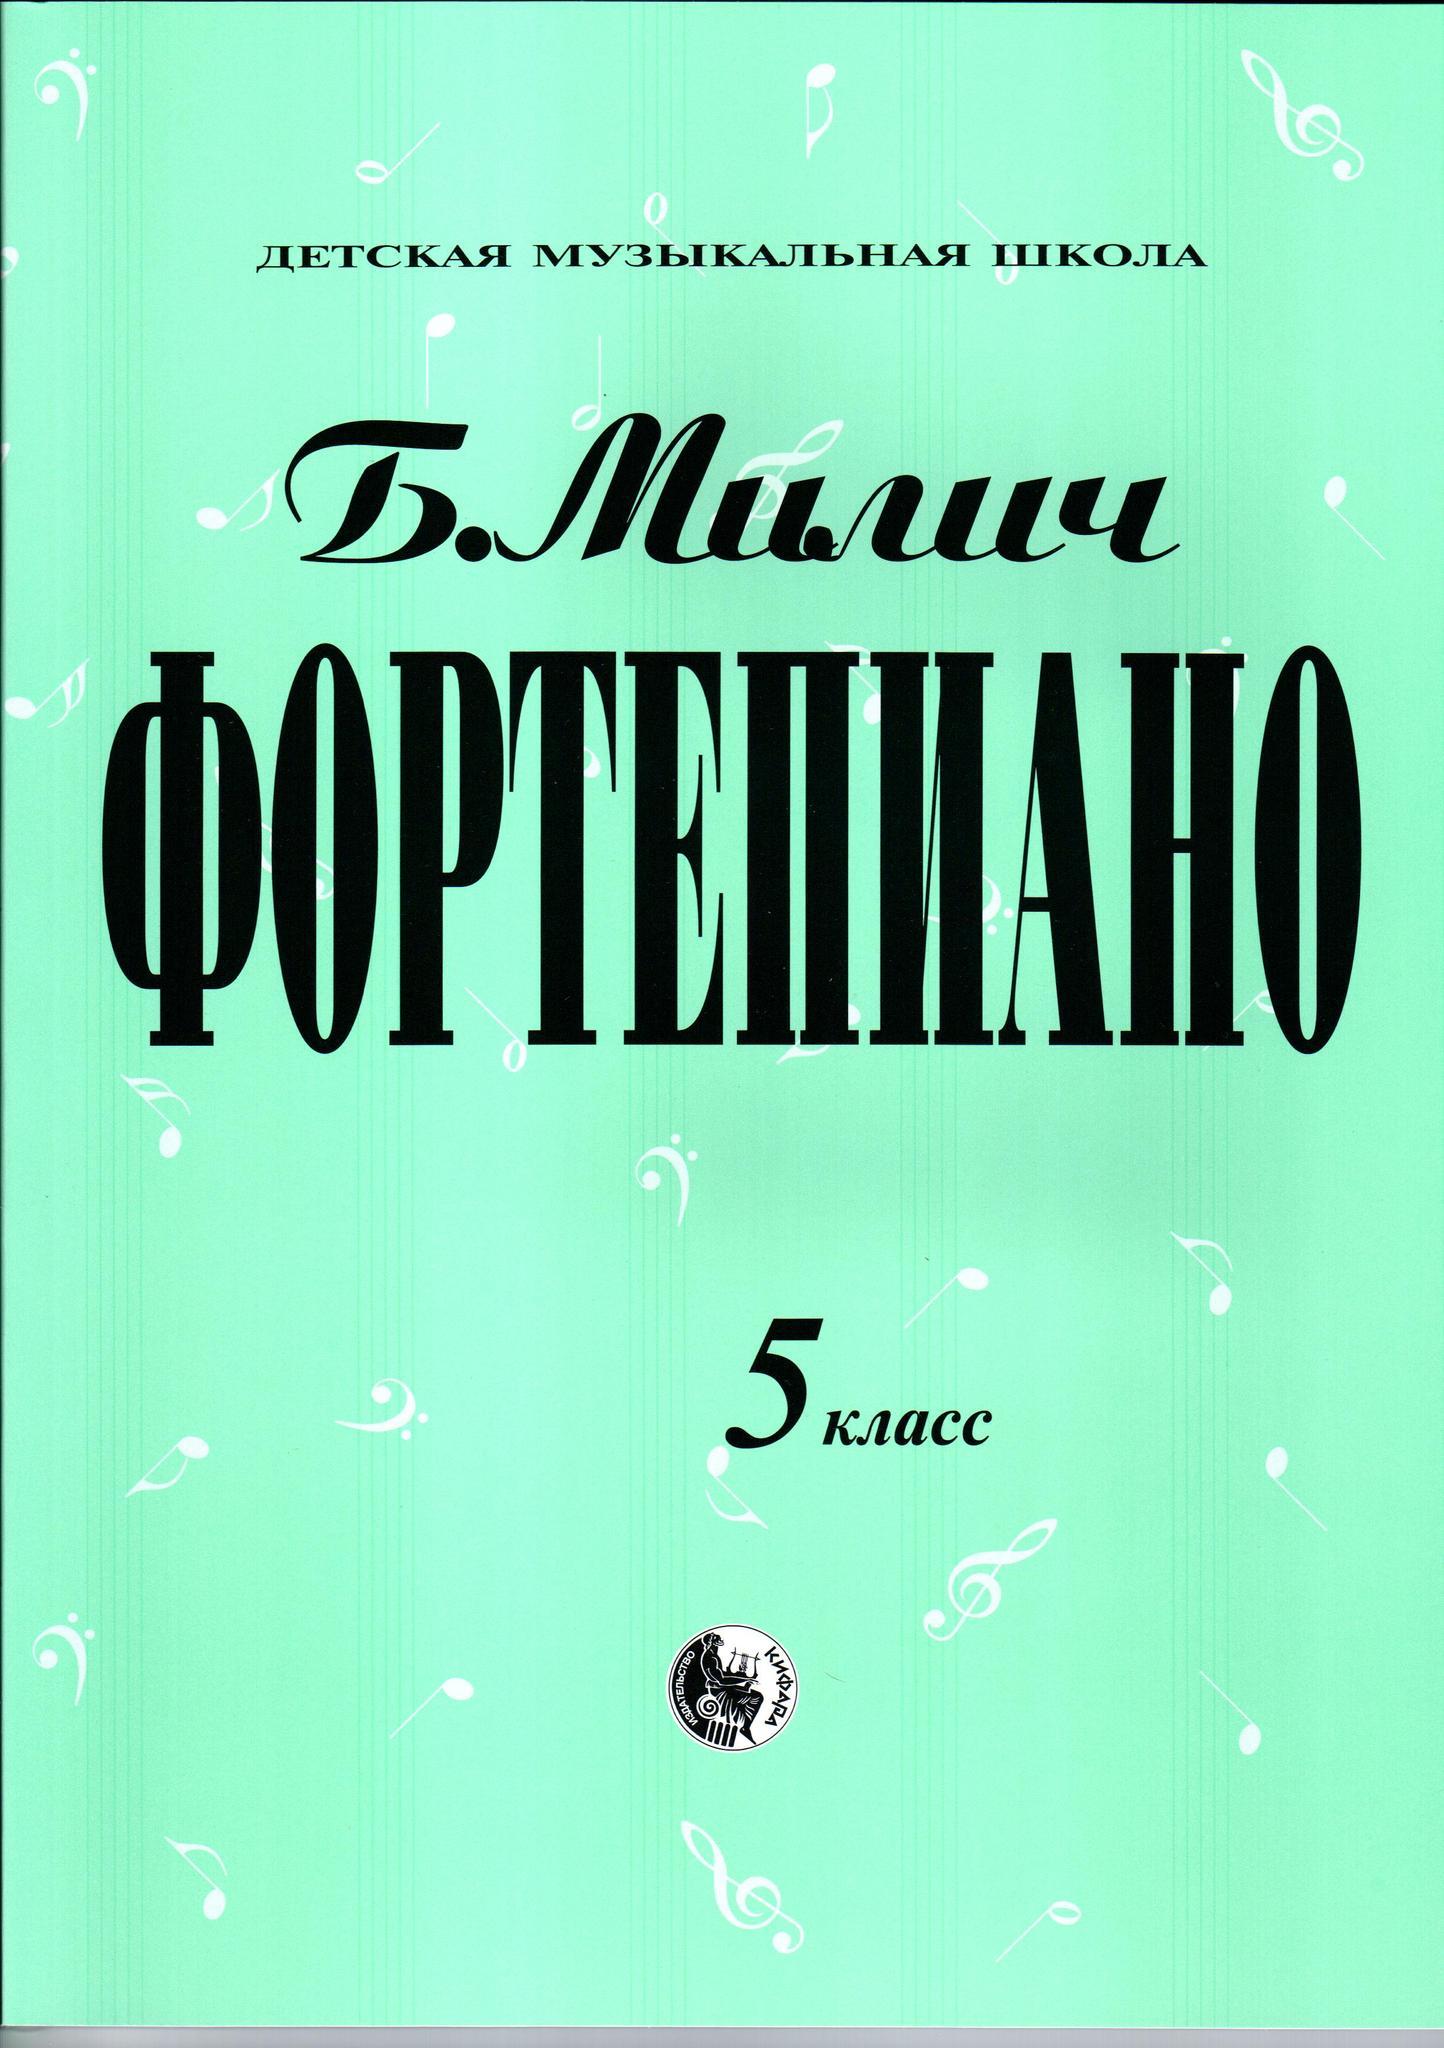 Милич Б. Фортепиано. 5 класс ДМШ